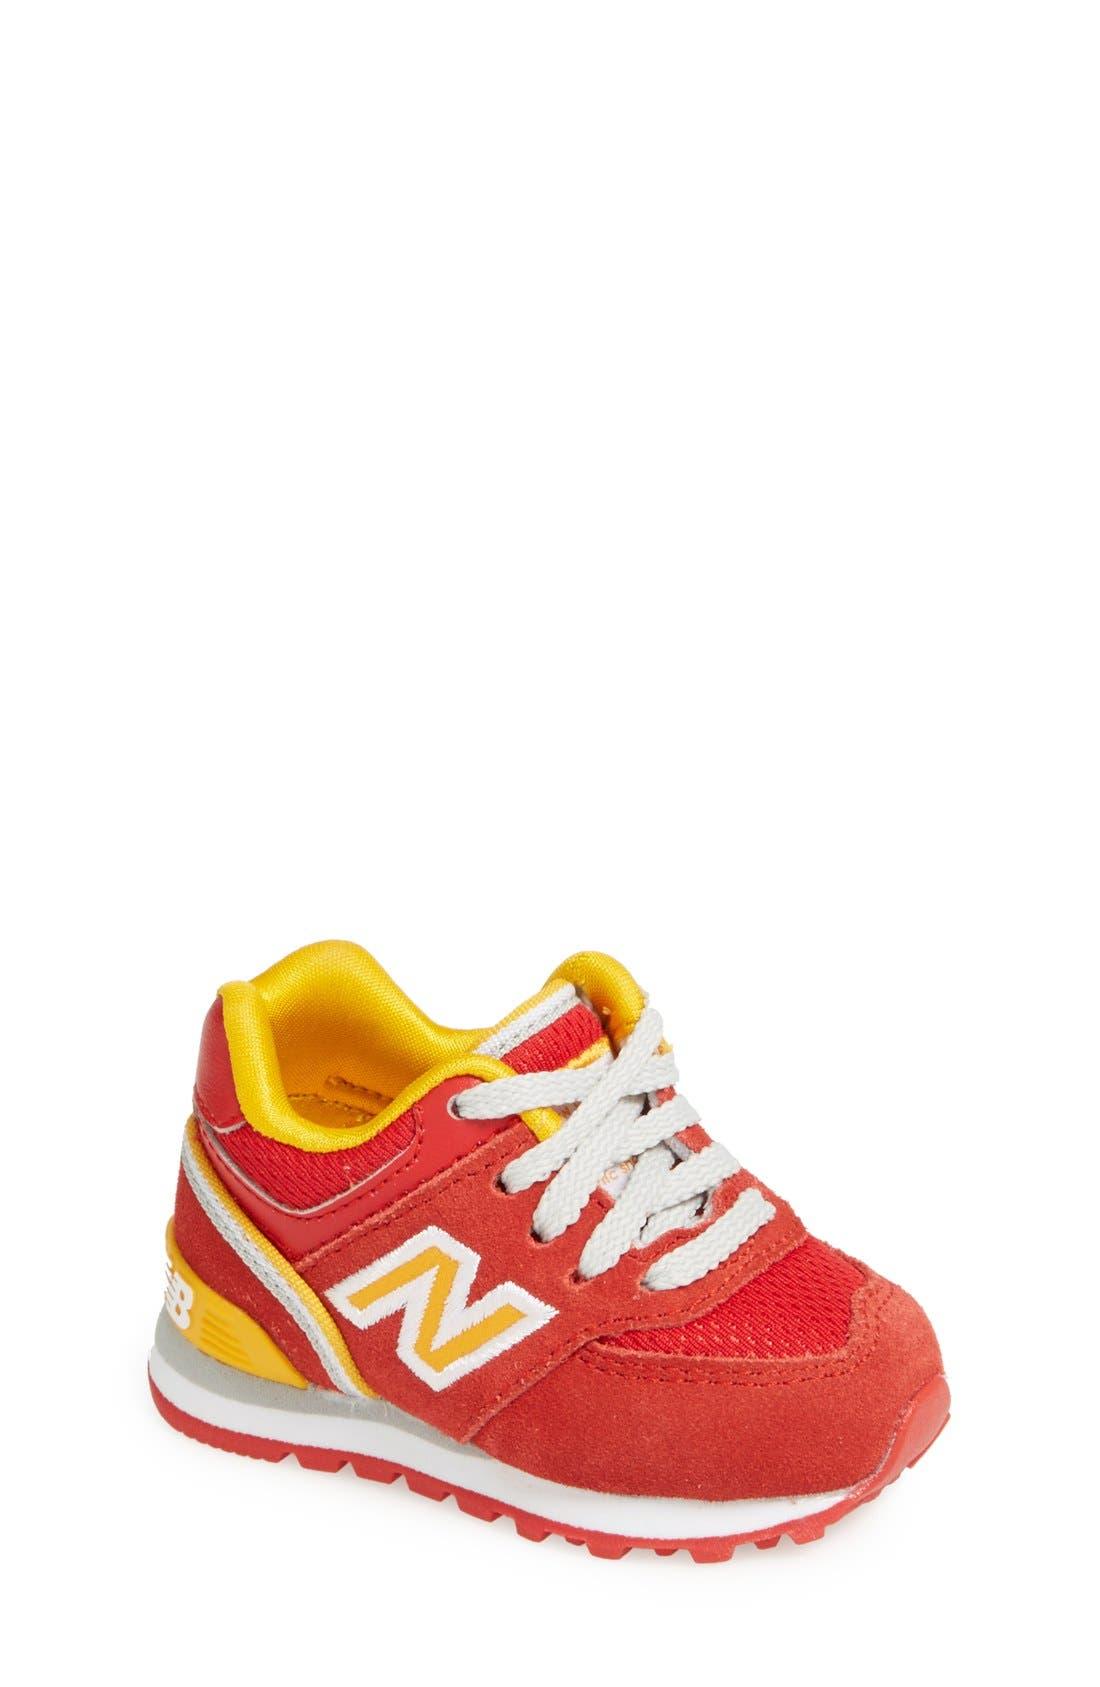 Alternate Image 1 Selected - New Balance '574 - Stadium' Sneaker (Baby, Walker & Toddler)